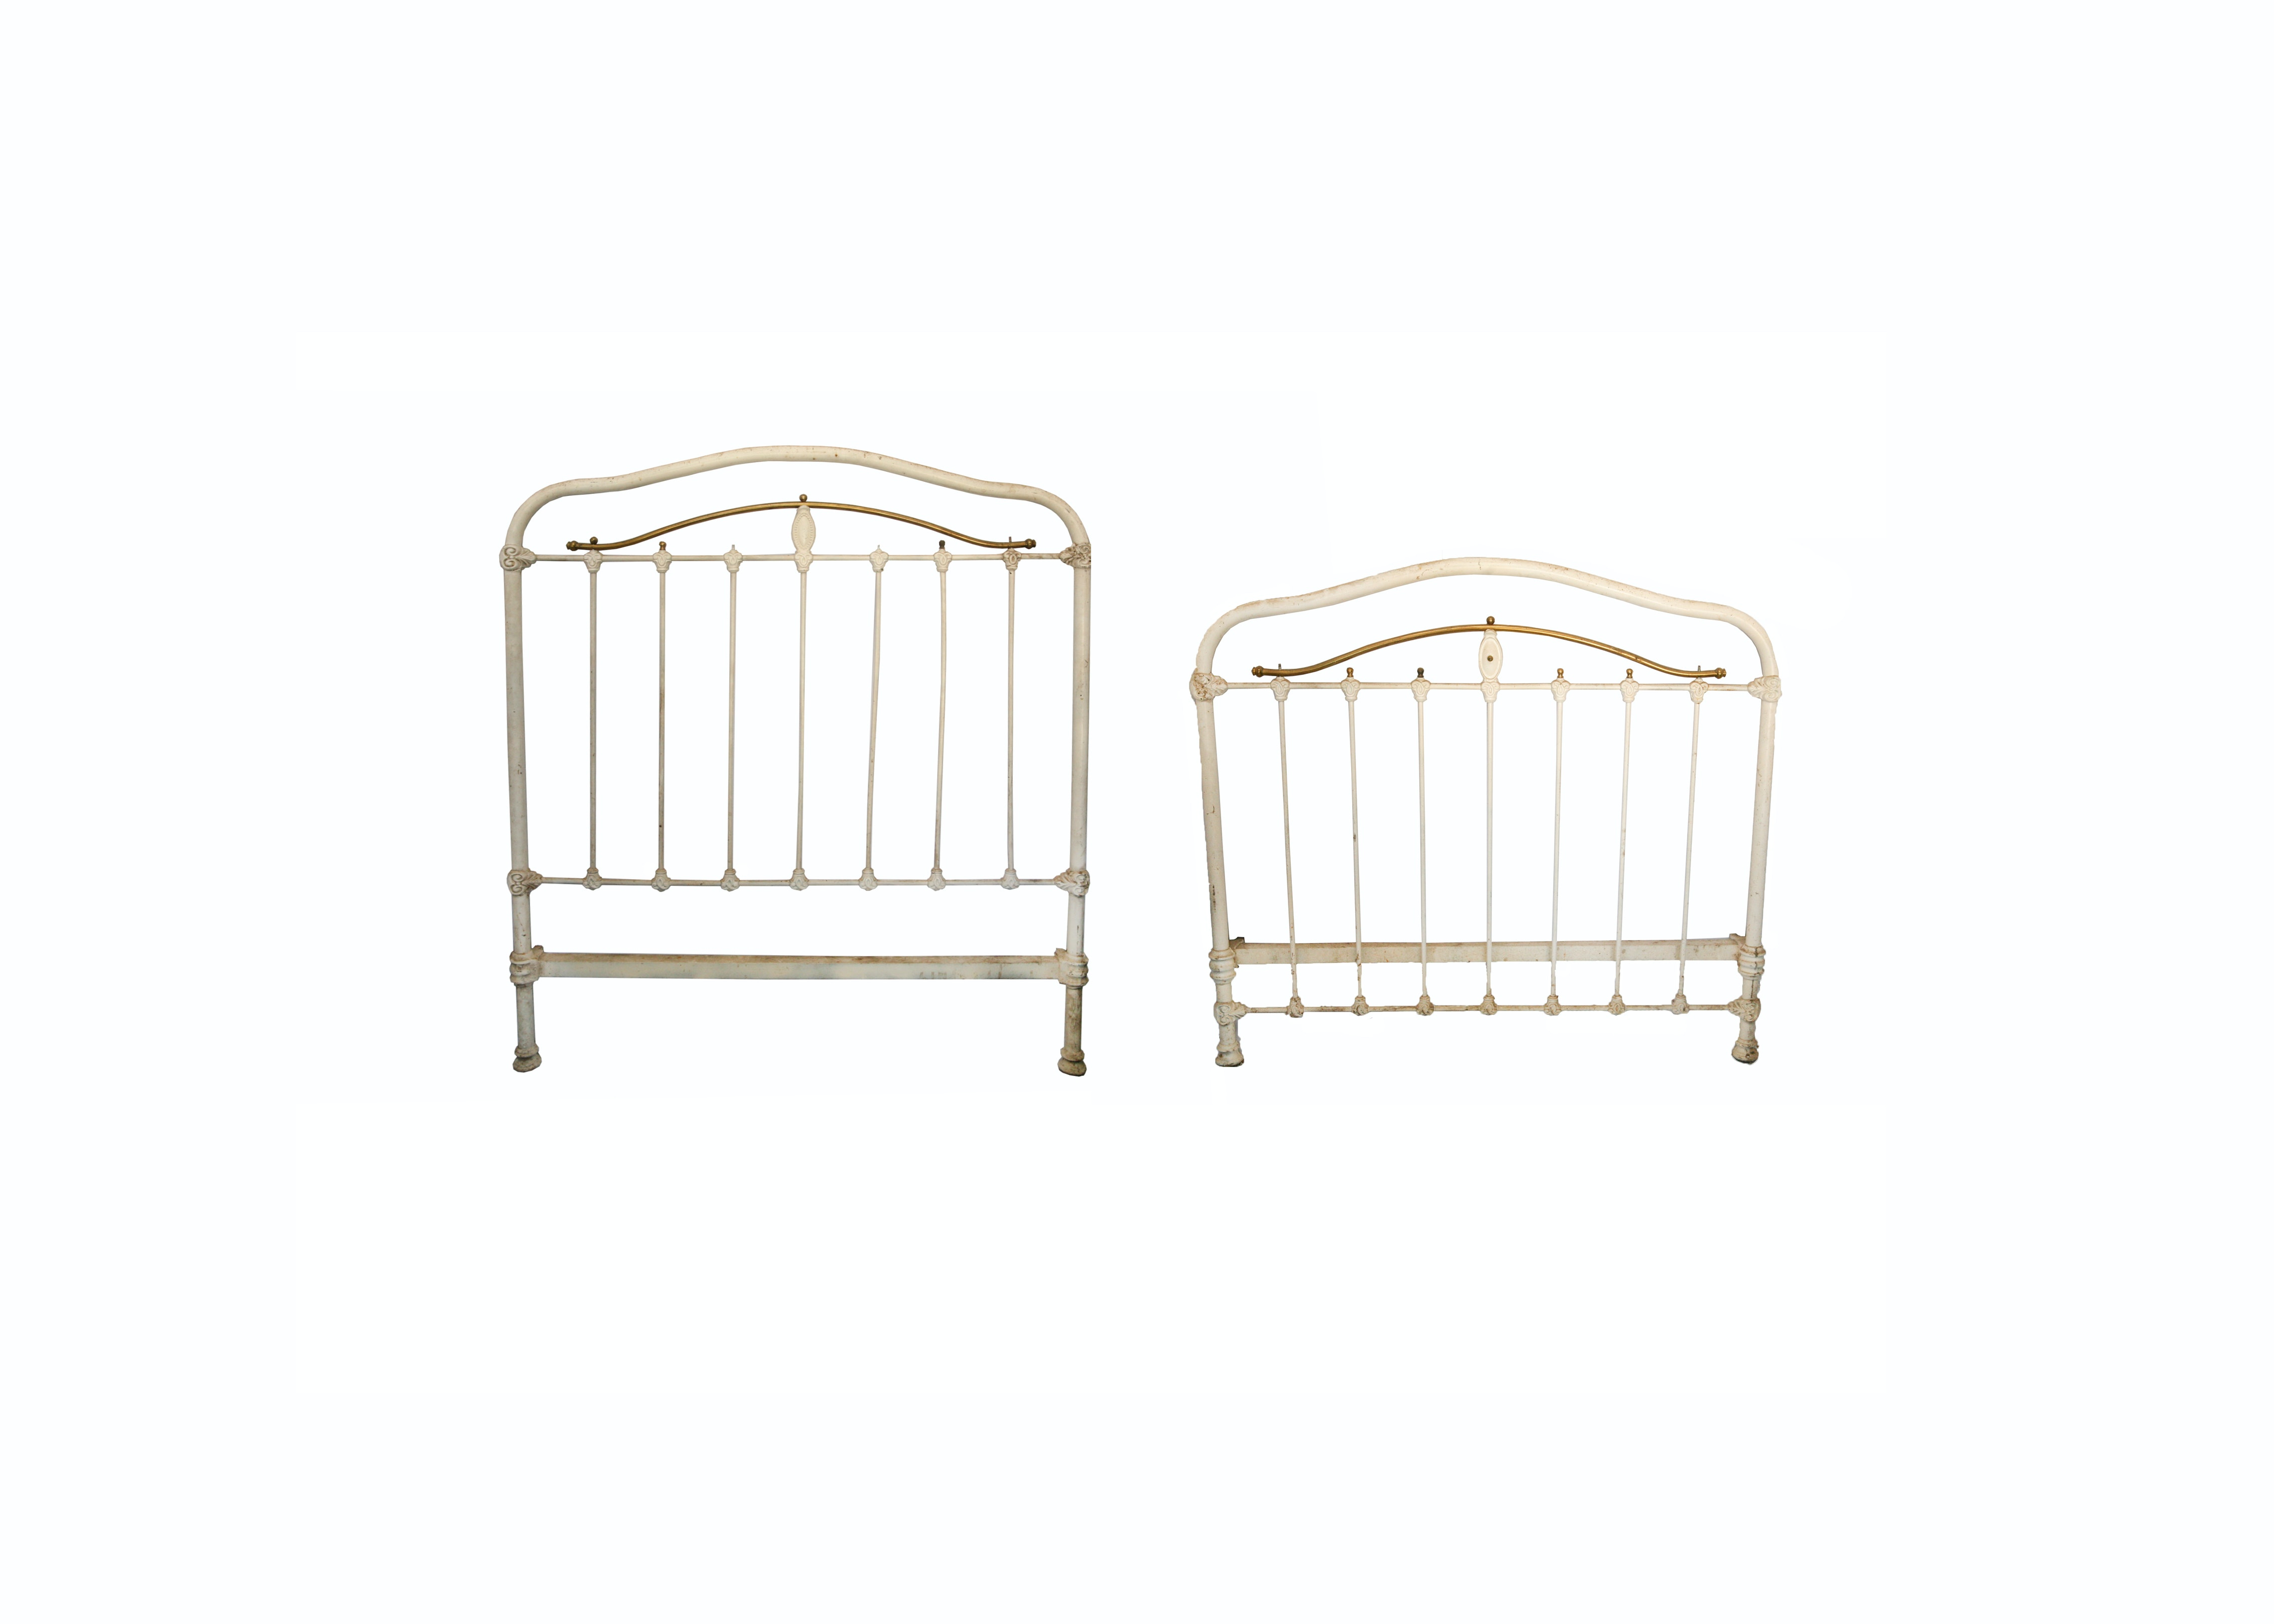 Antique Three-Quarter Size Cast Iron Bed Frame